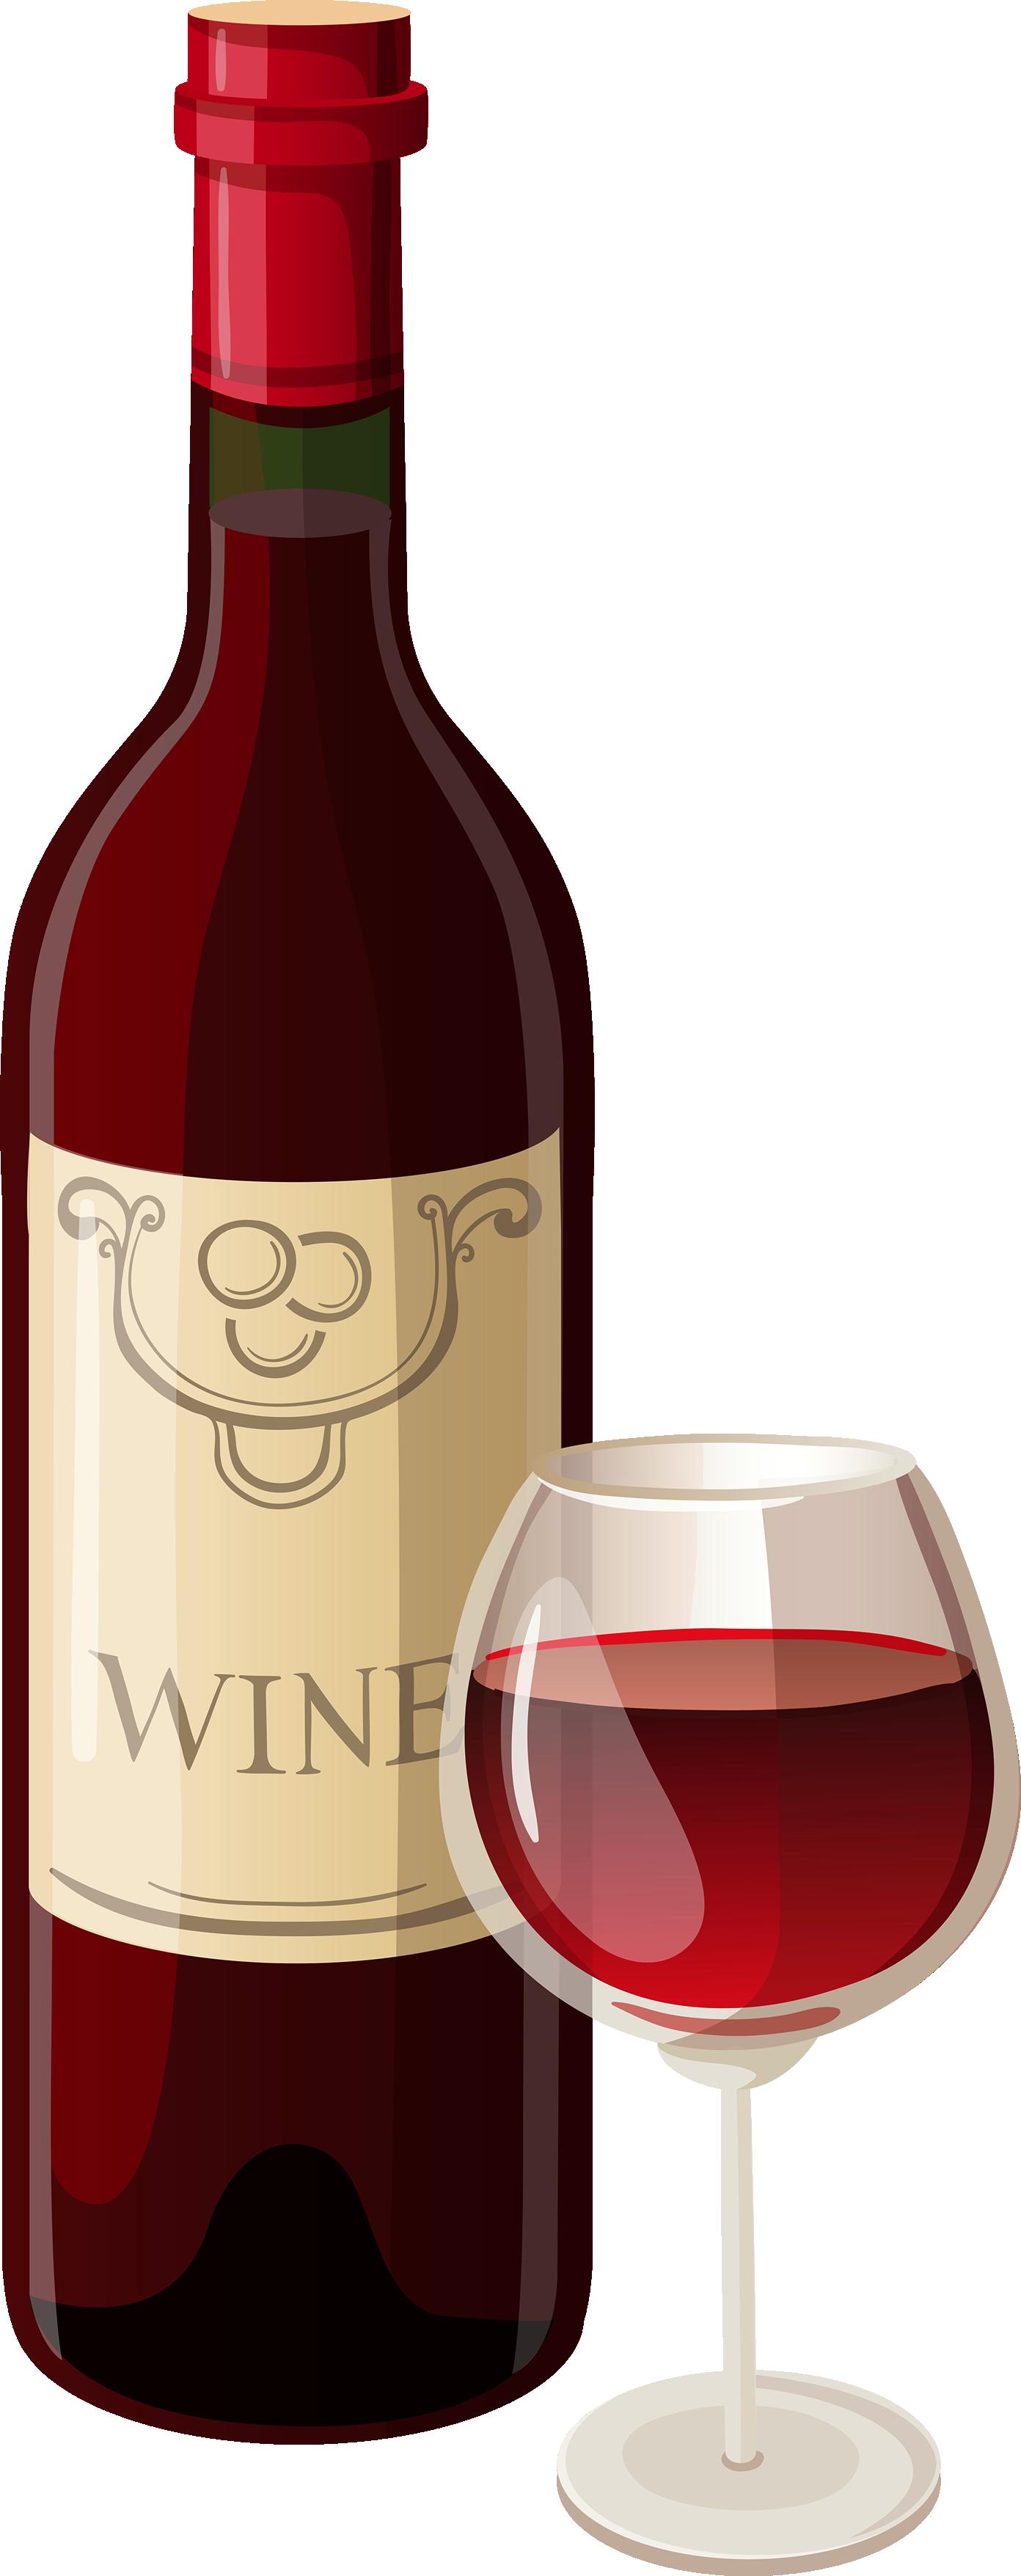 Wine PNG Transparent image - Wine PNG